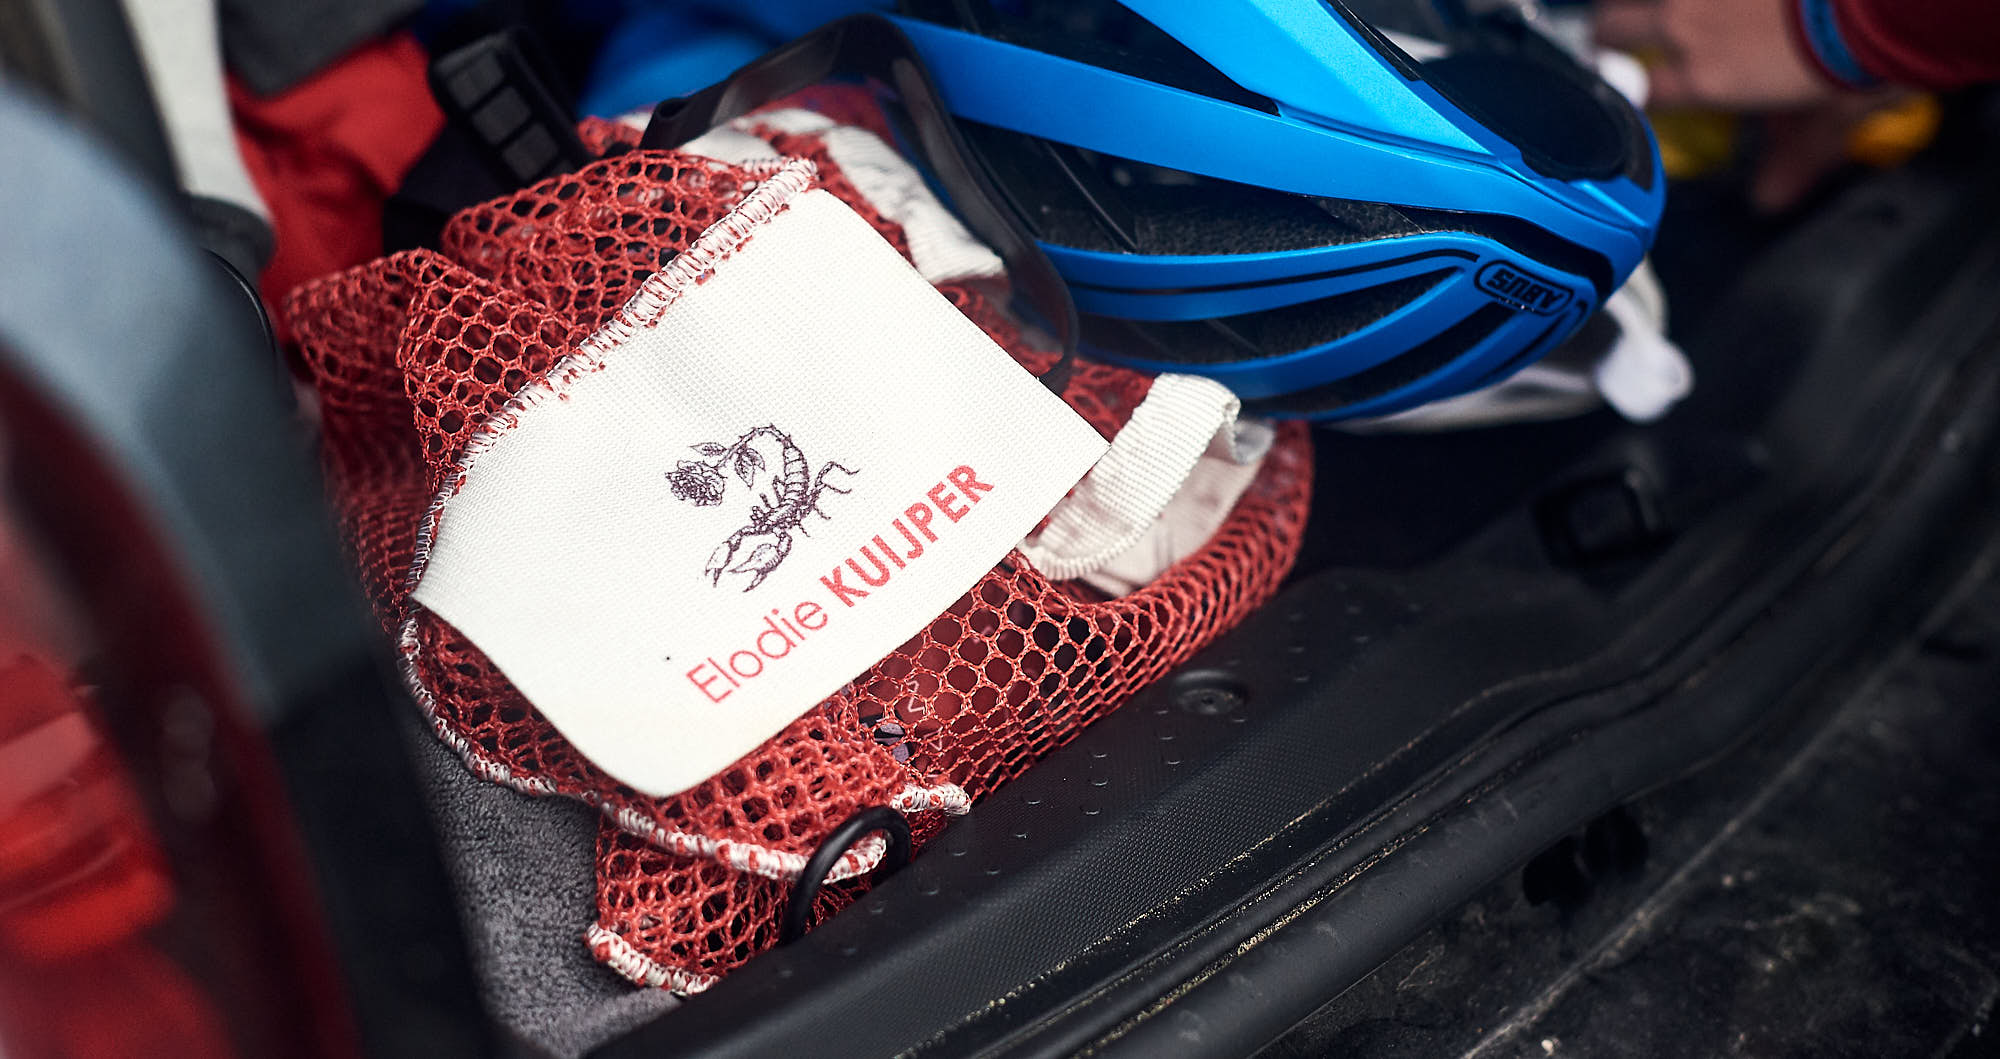 Cyclist's washing bag